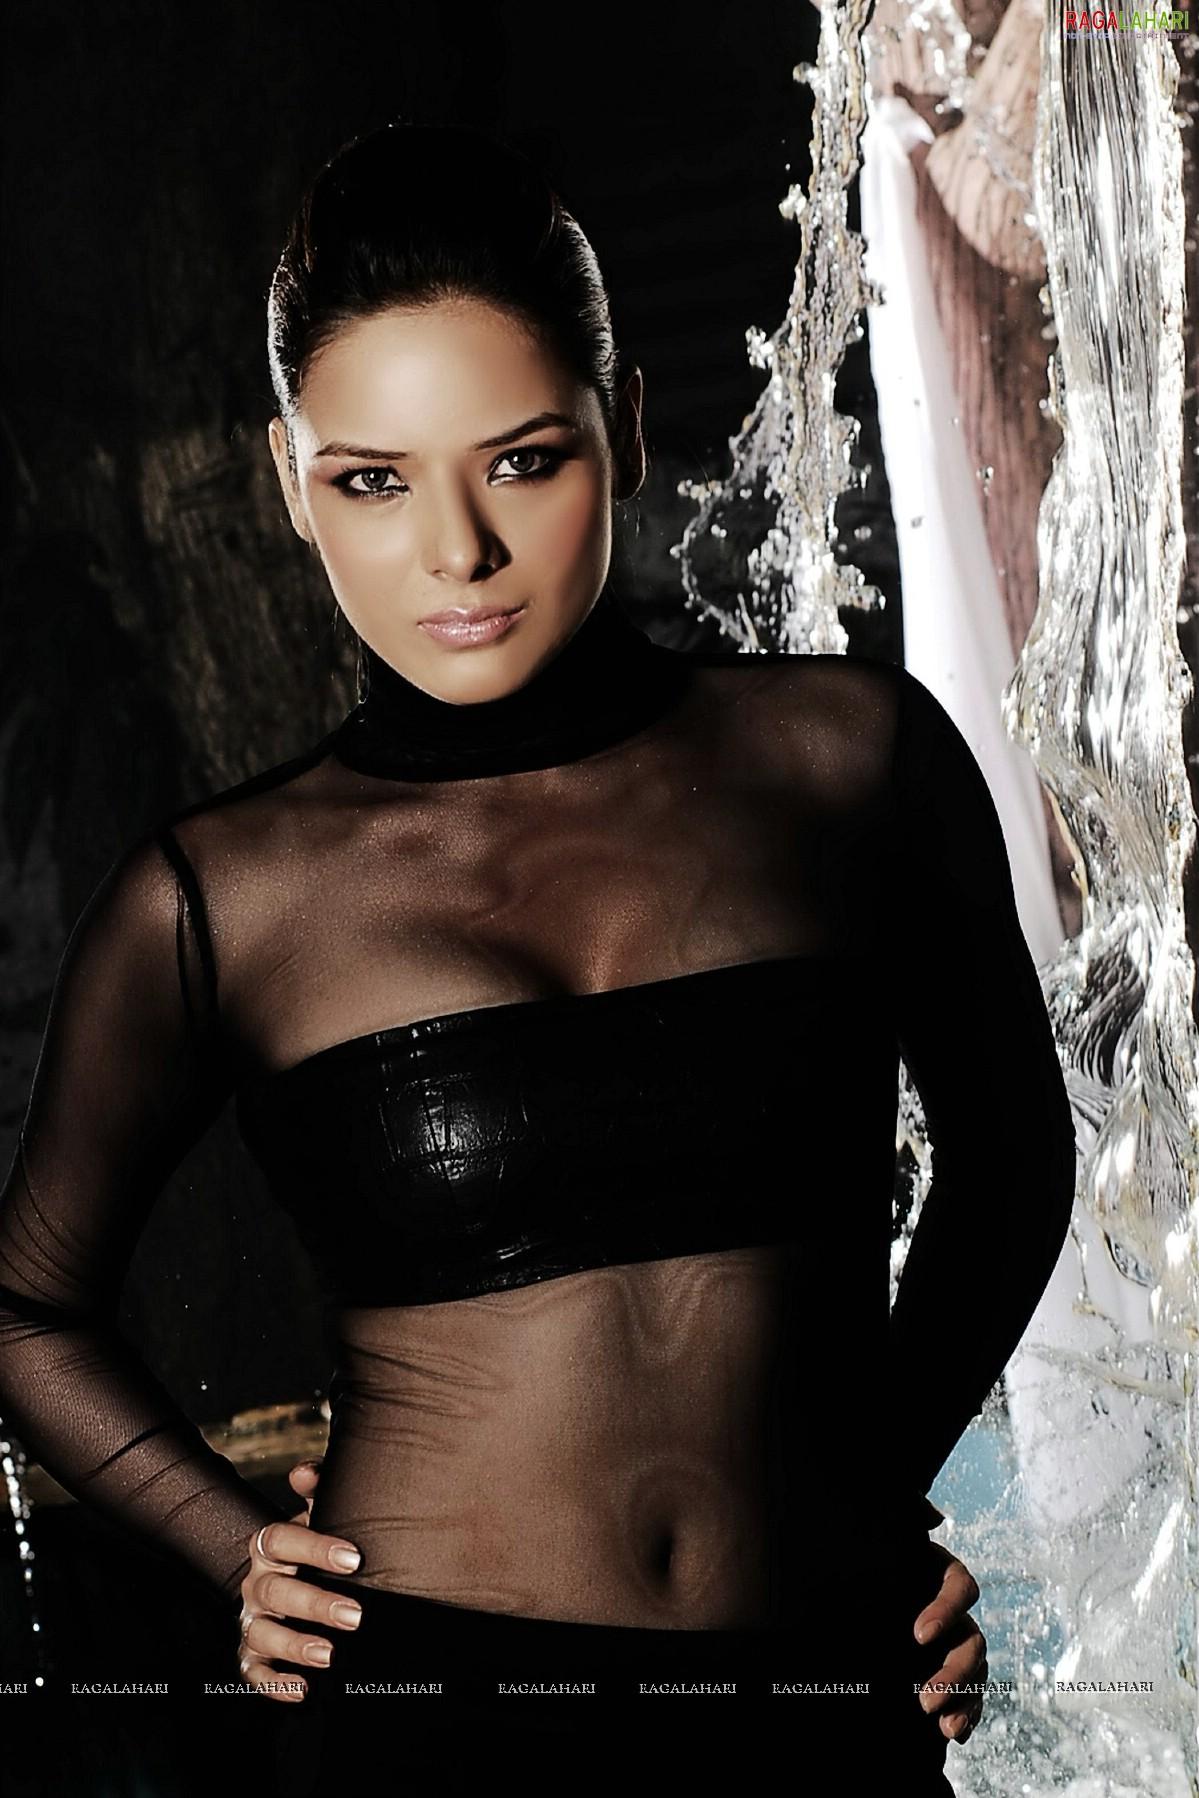 Annie Ilonzeh born August 23, 1983 (age 35),Kendra Lust Sex fotos 16. Jennifer Lopez,Navina Bole 2011